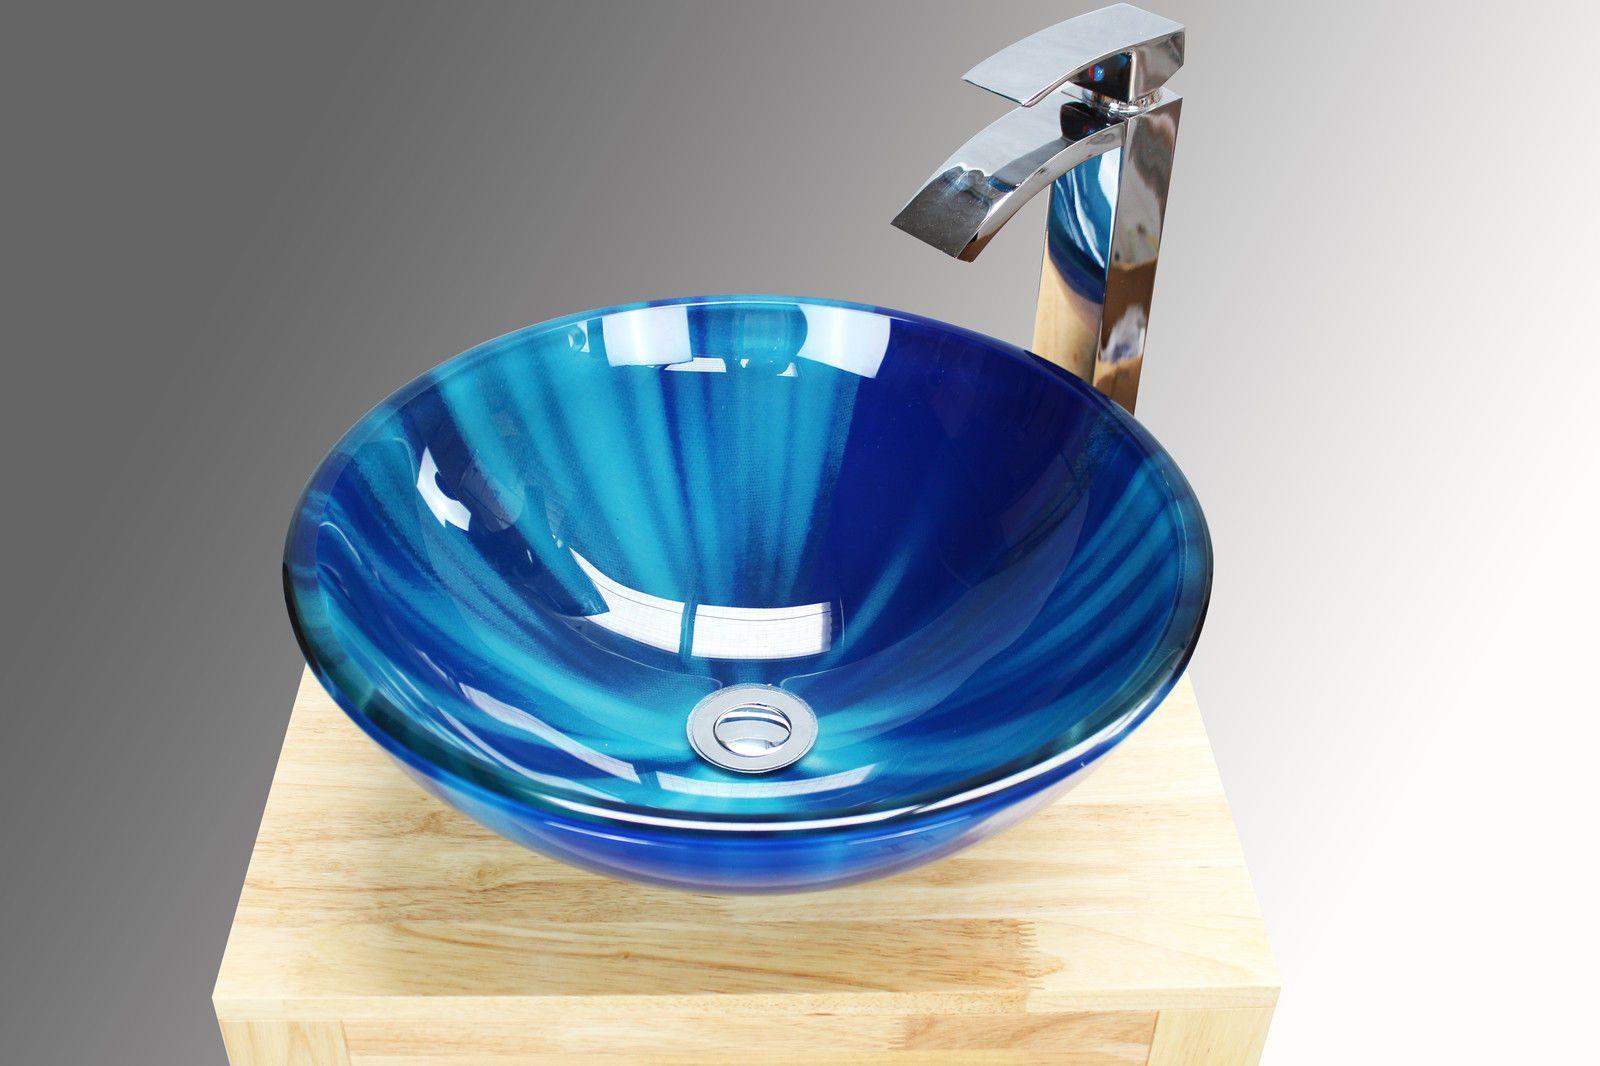 Pin By Uk Smart Supplies On Bath Basins Sinks